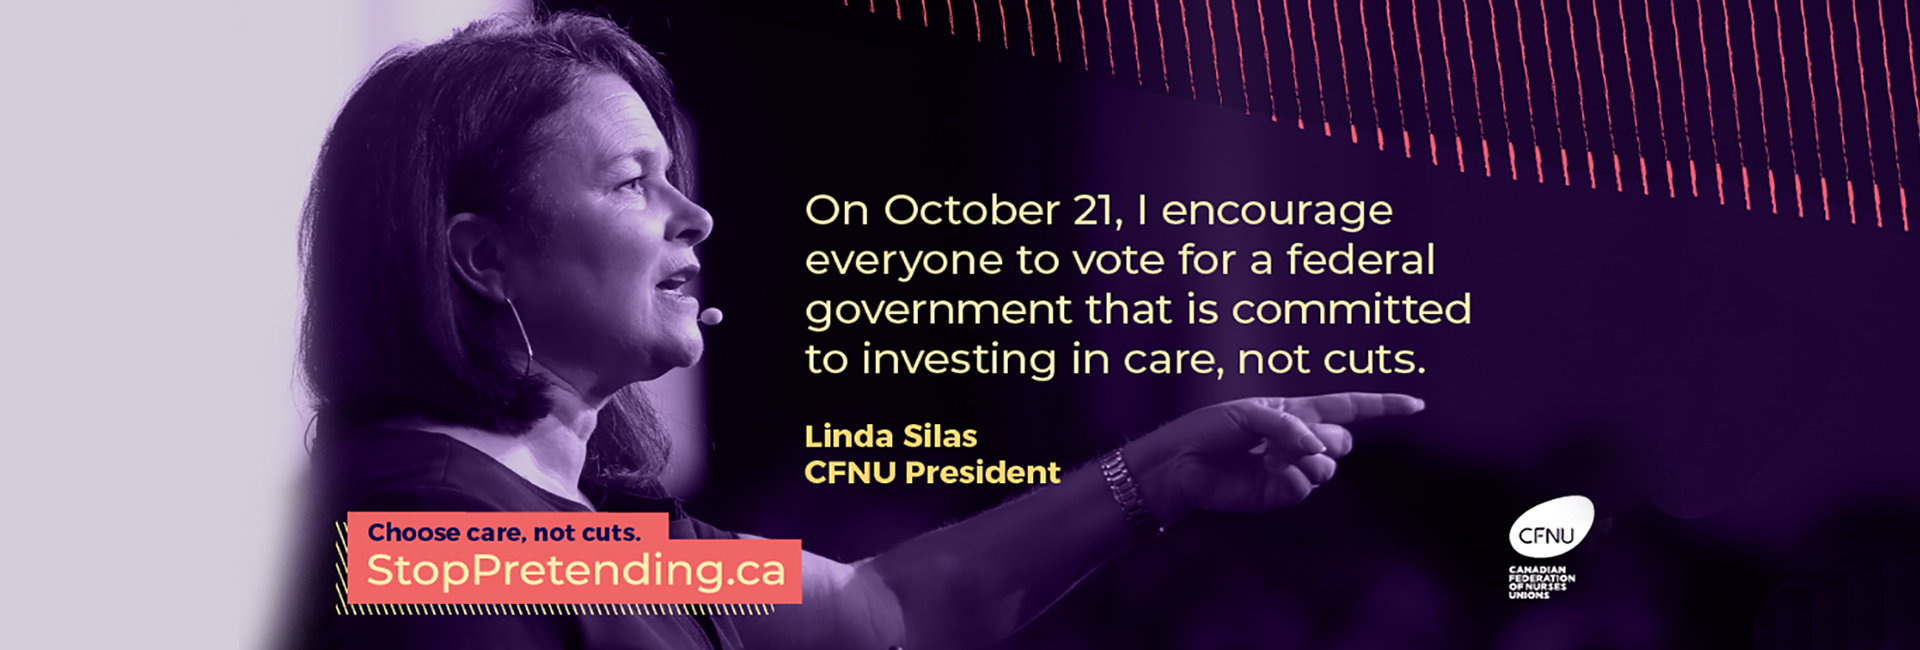 Stop Pretending - Choose care, not cuts.